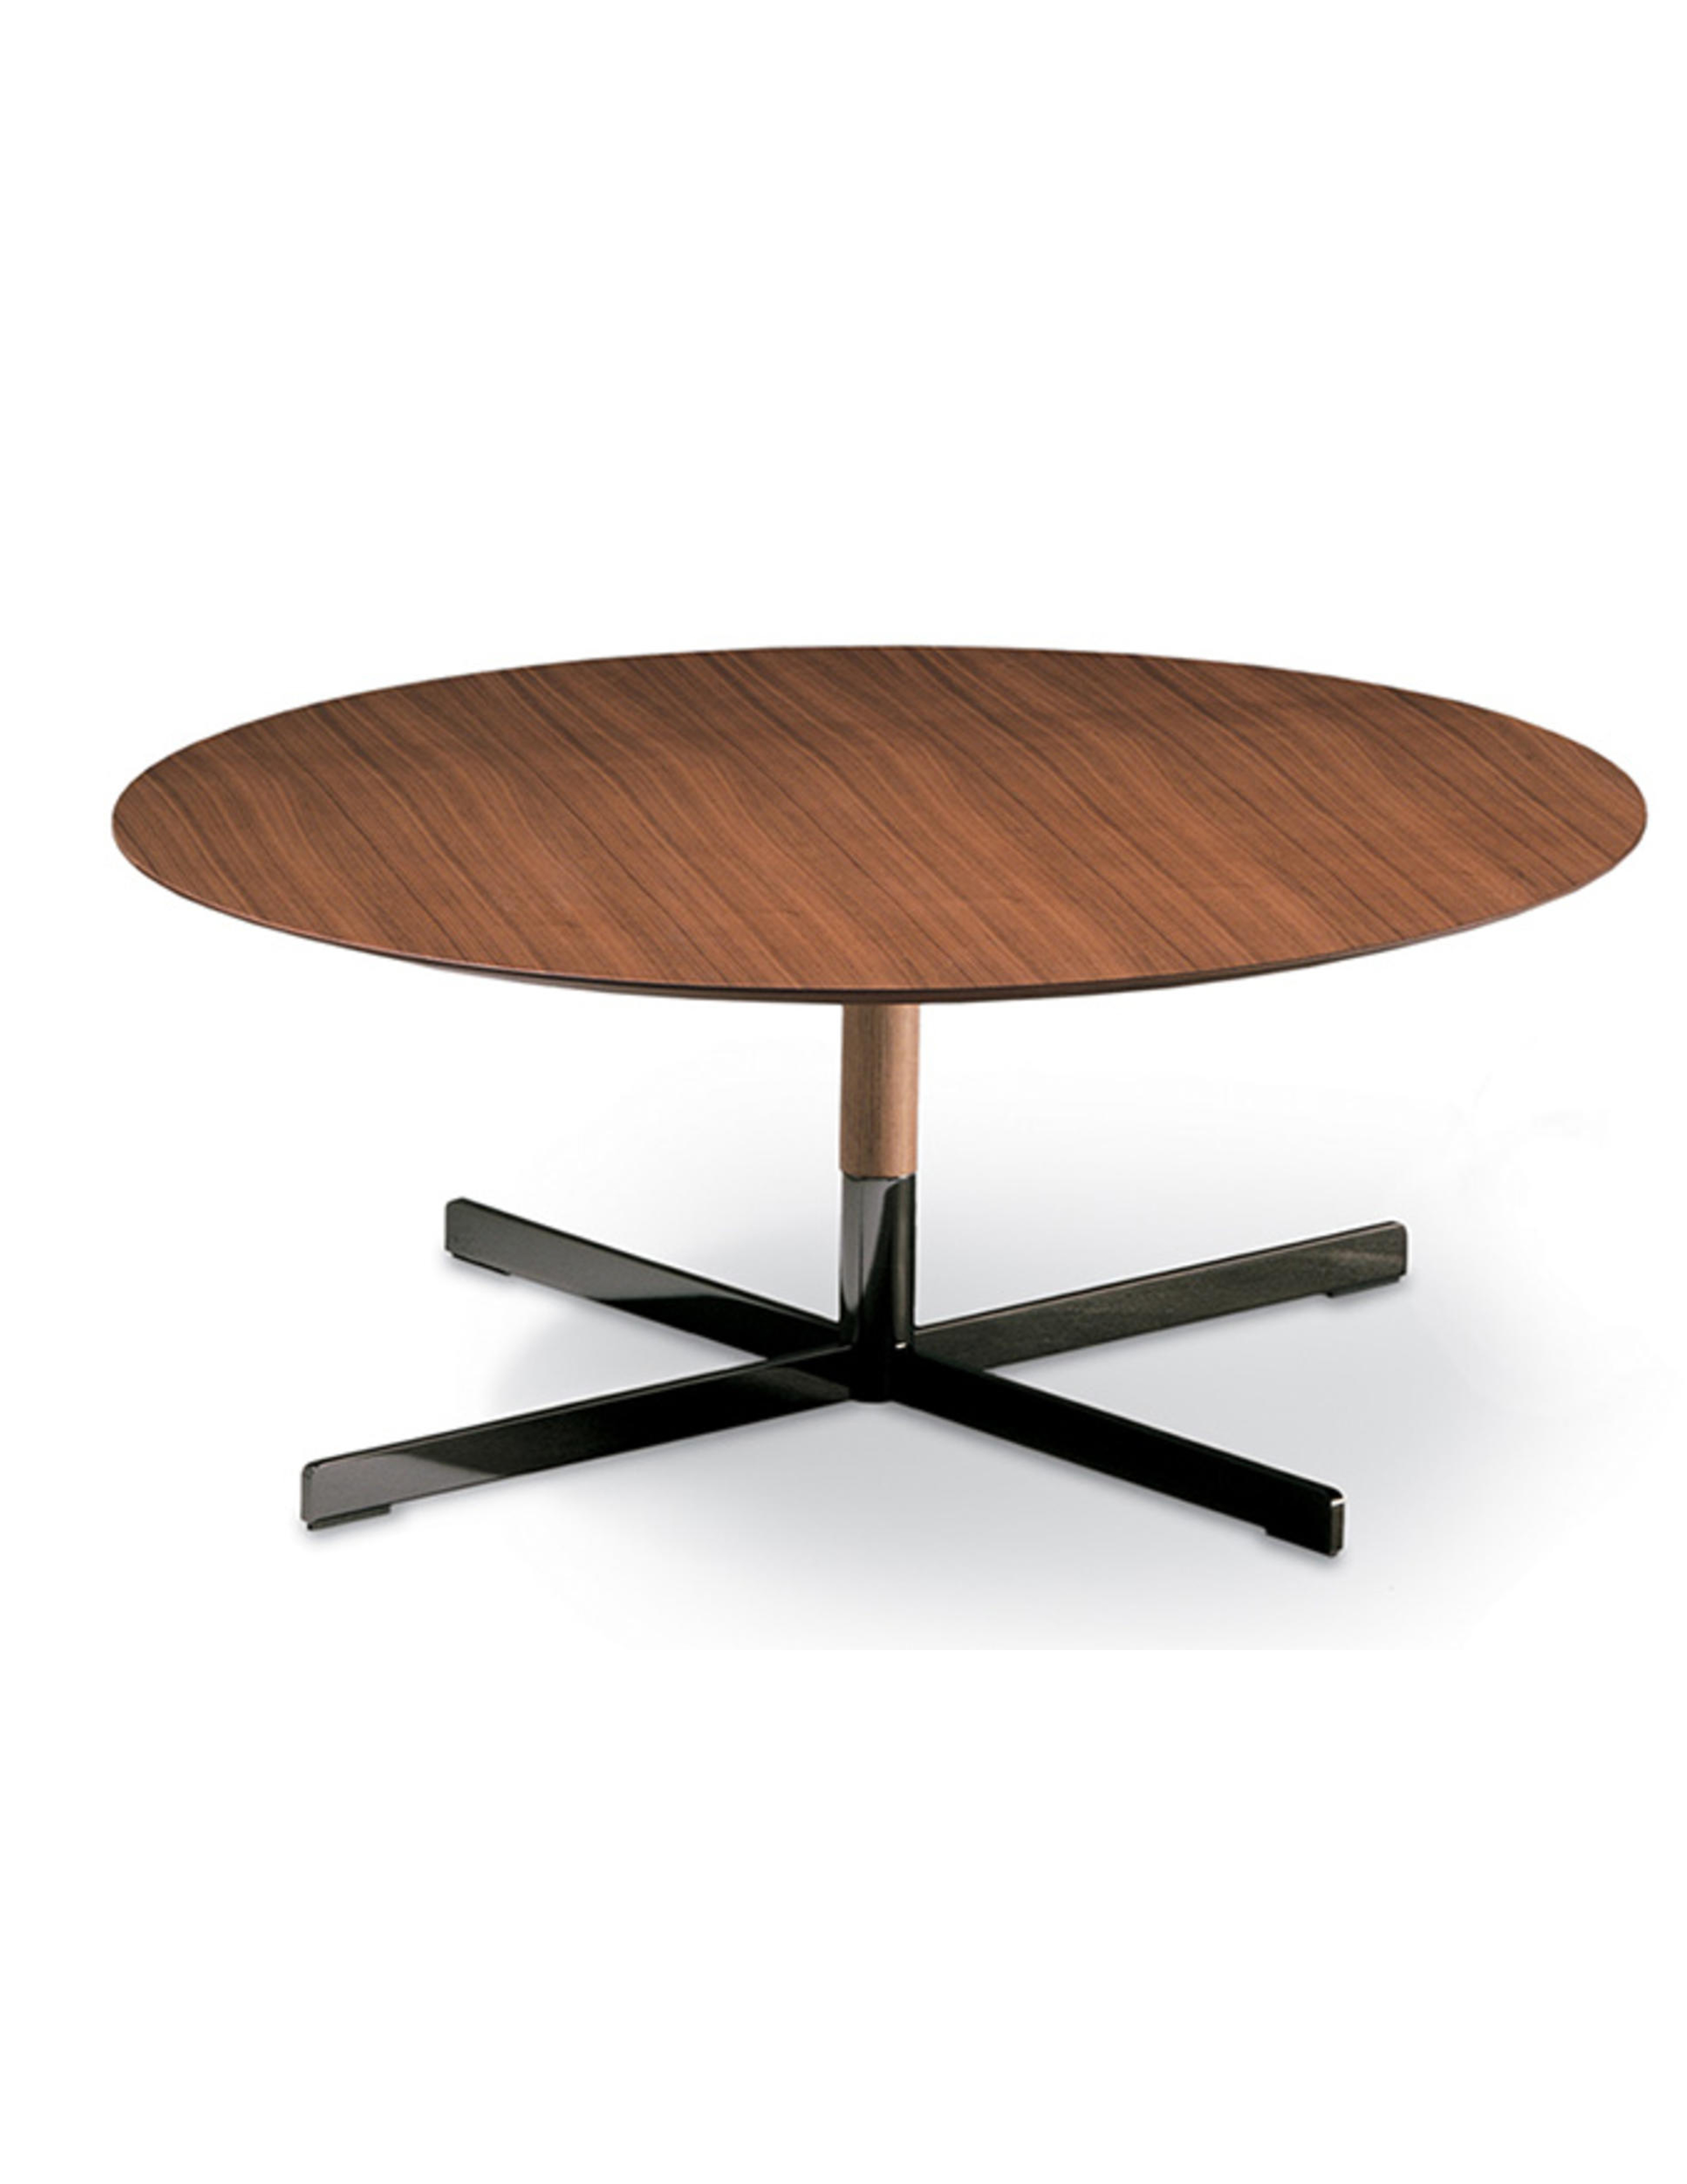 Poltrona Frau Mestre.Tables Poltrona Frau Molteni C Flexform Etreluxe